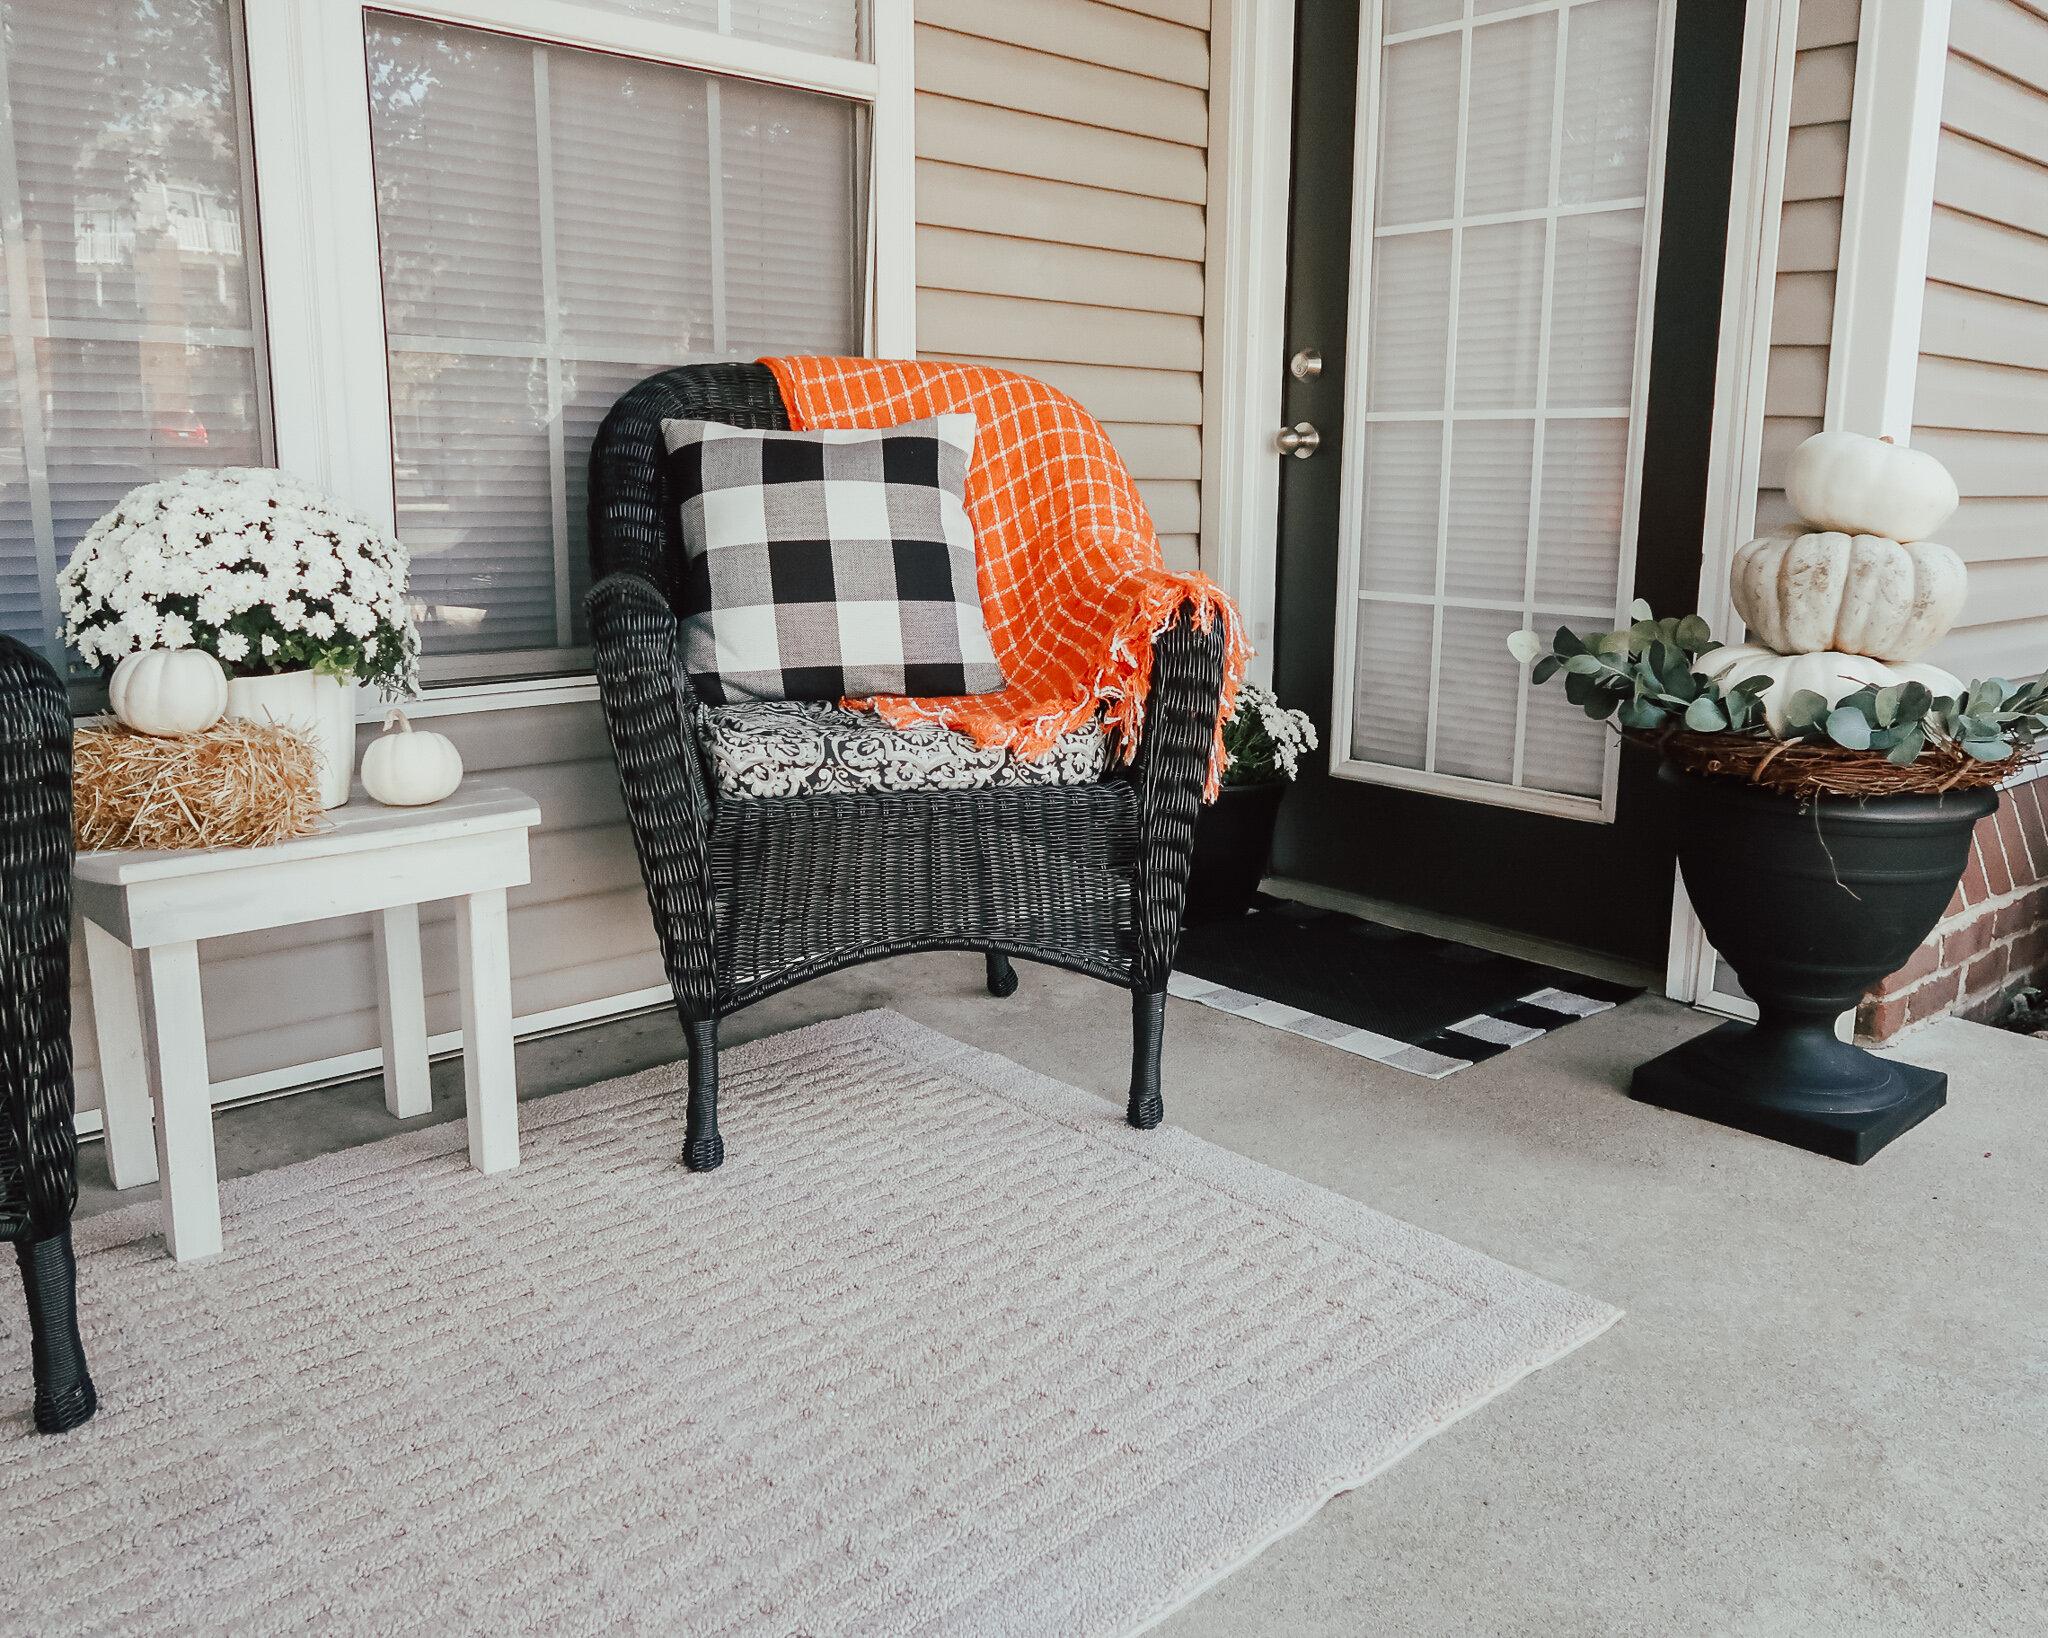 fall-front-porch-decor-15.jpg